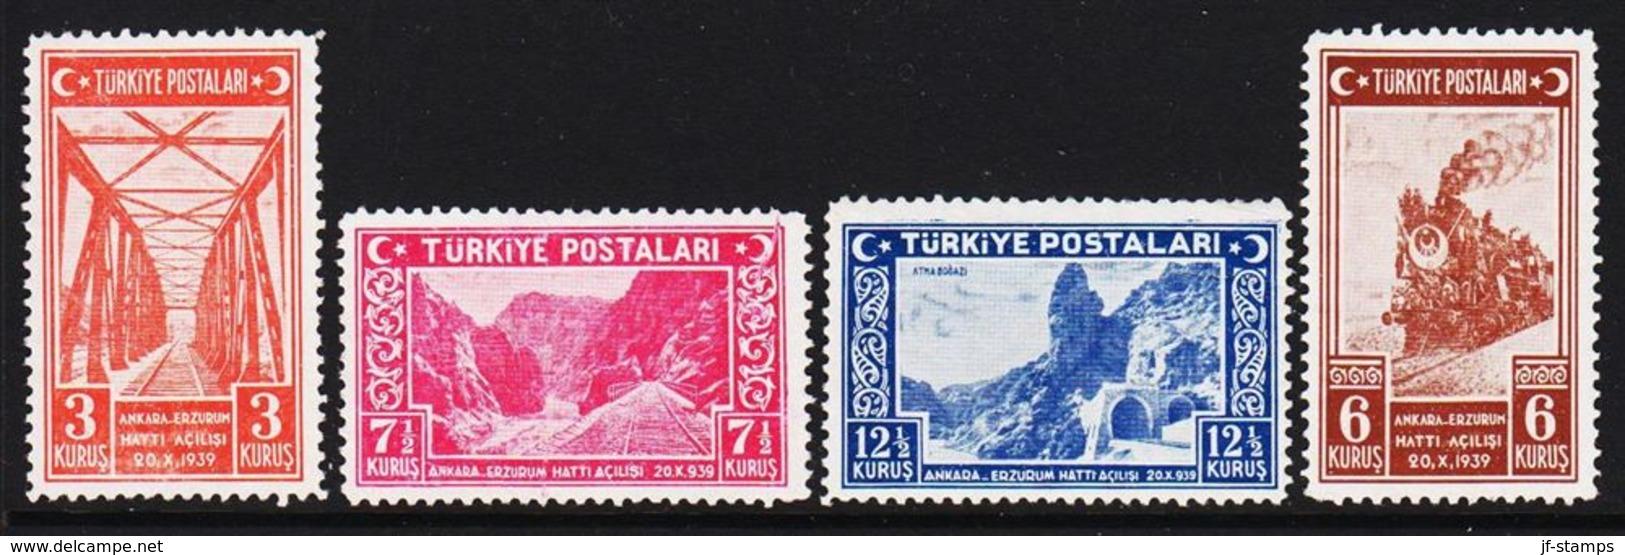 1939. Eisenbahn Ankara - Erzurum. 4 Ex.  (Michel 1059 - 1062) - JF303681 - Nuevos